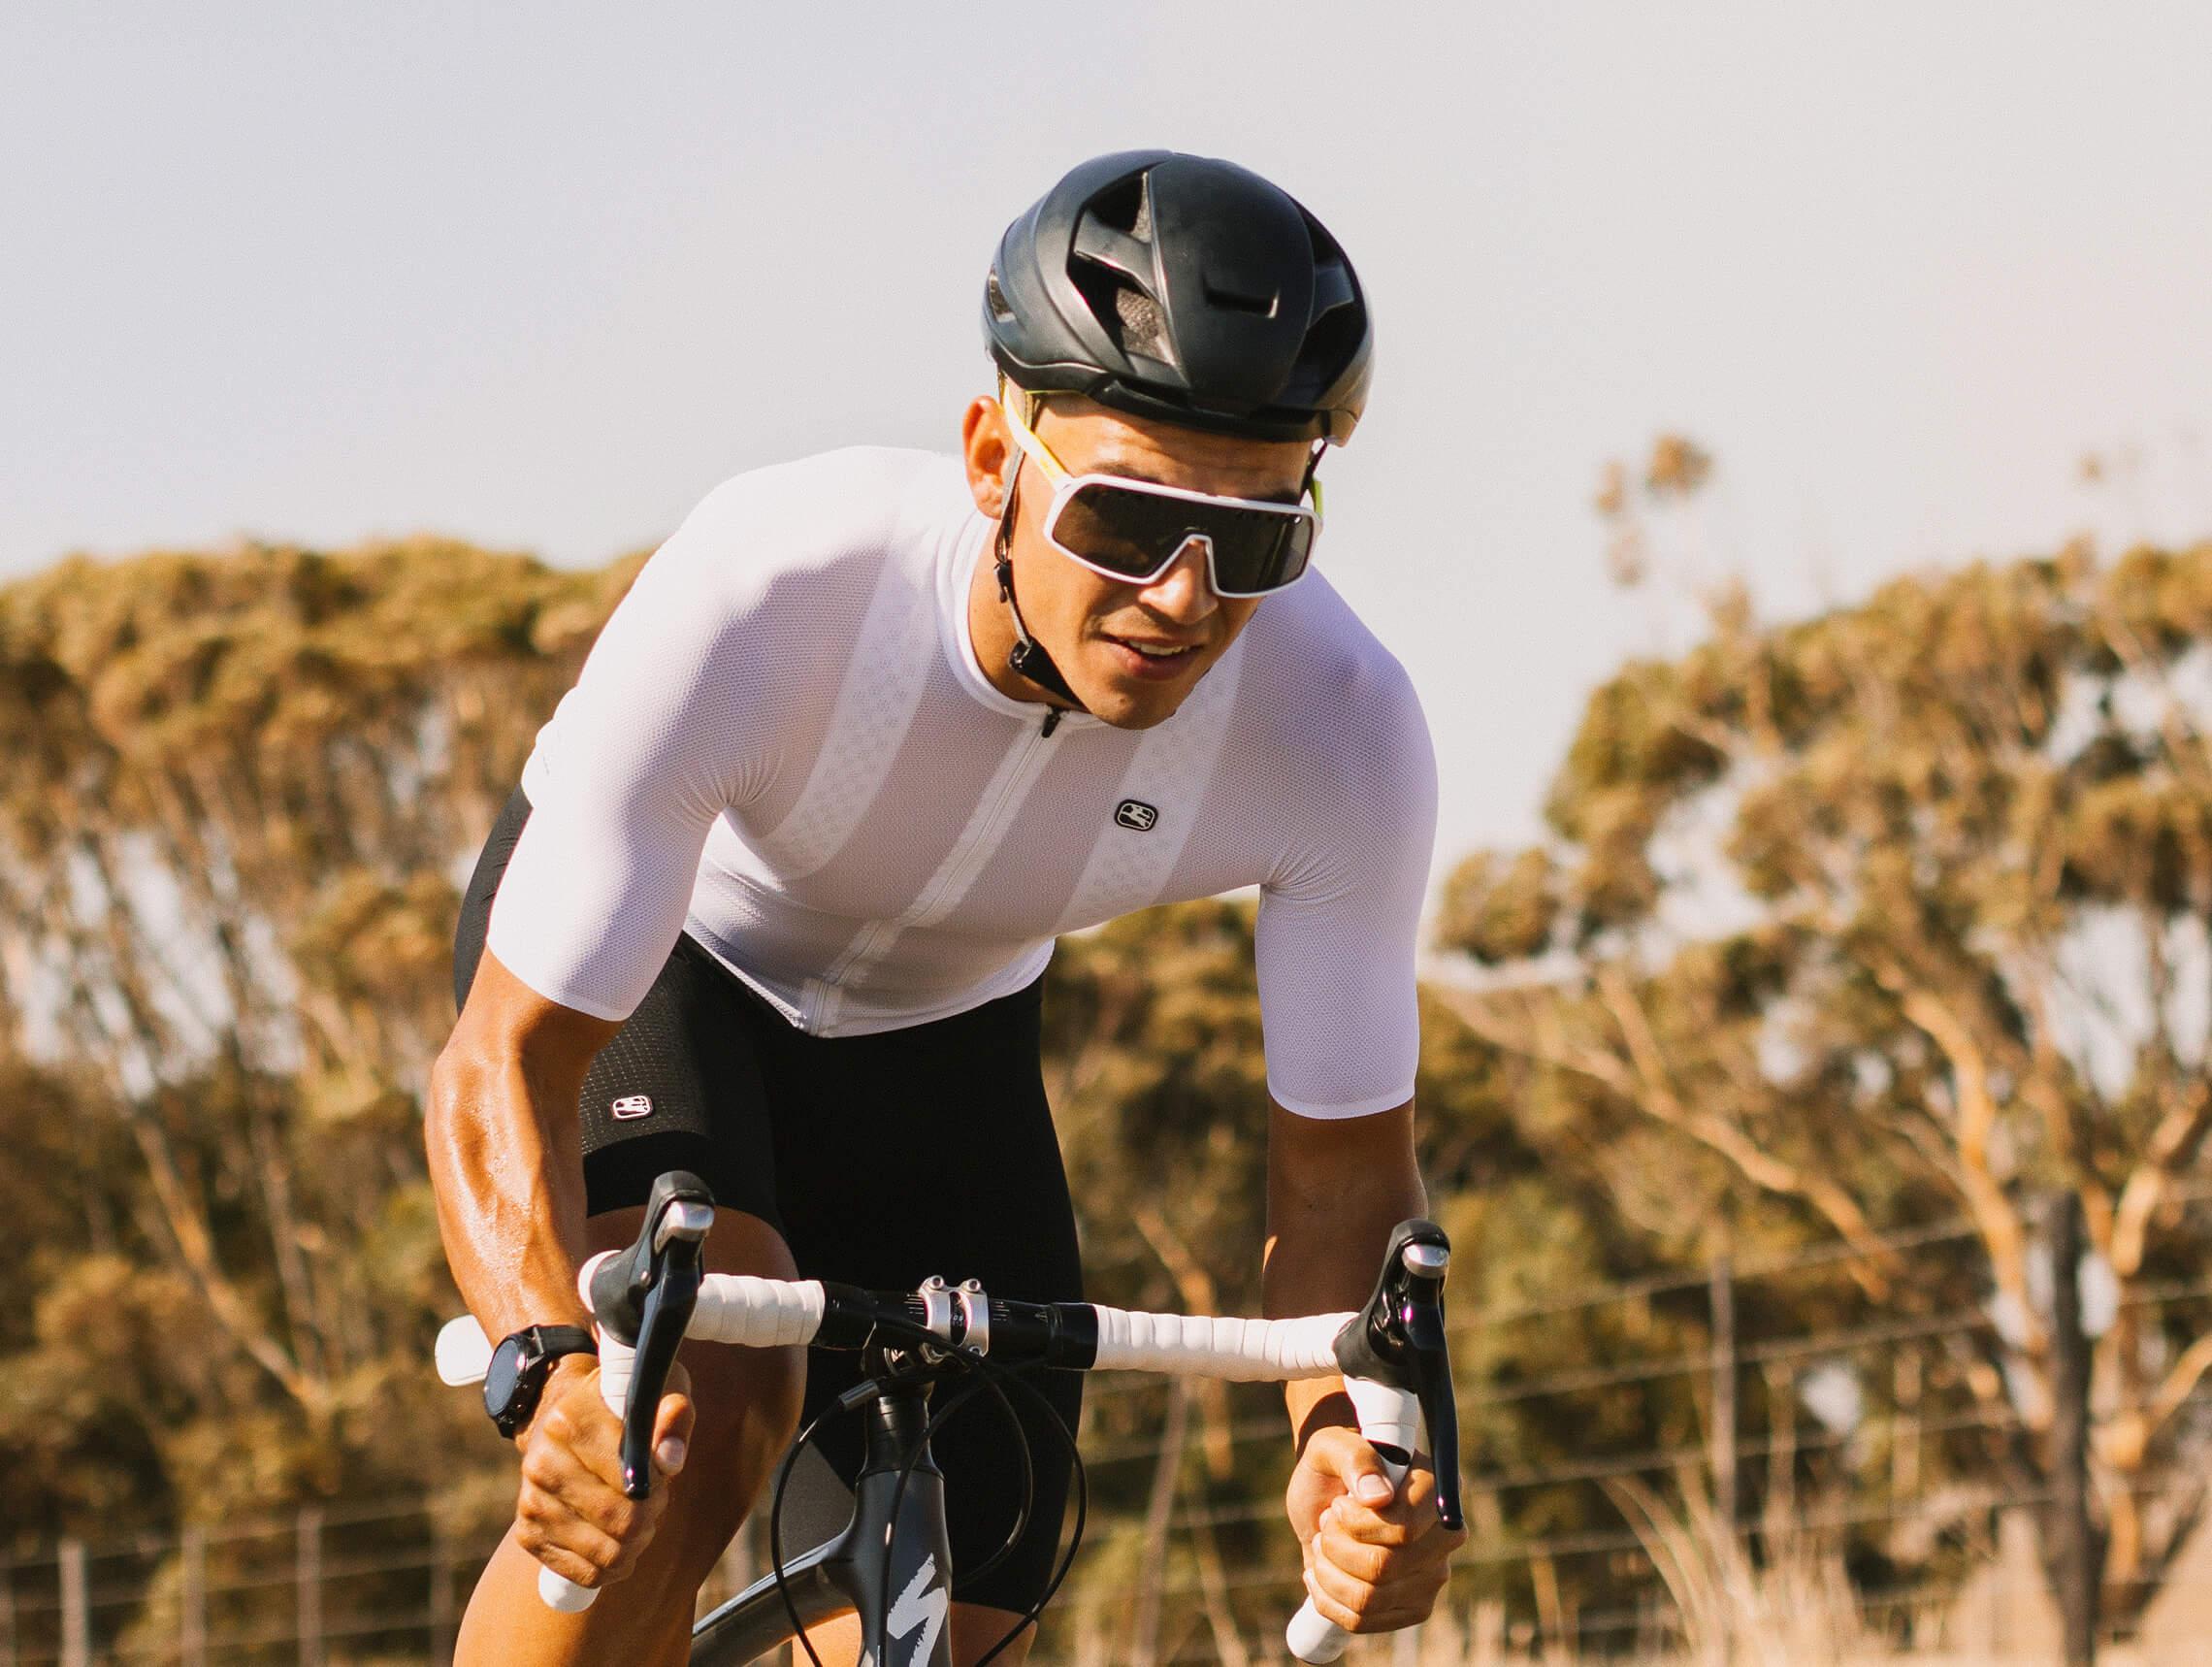 giordana-cycling-ss21-jersey-guide-men-fr-c-lyte-1